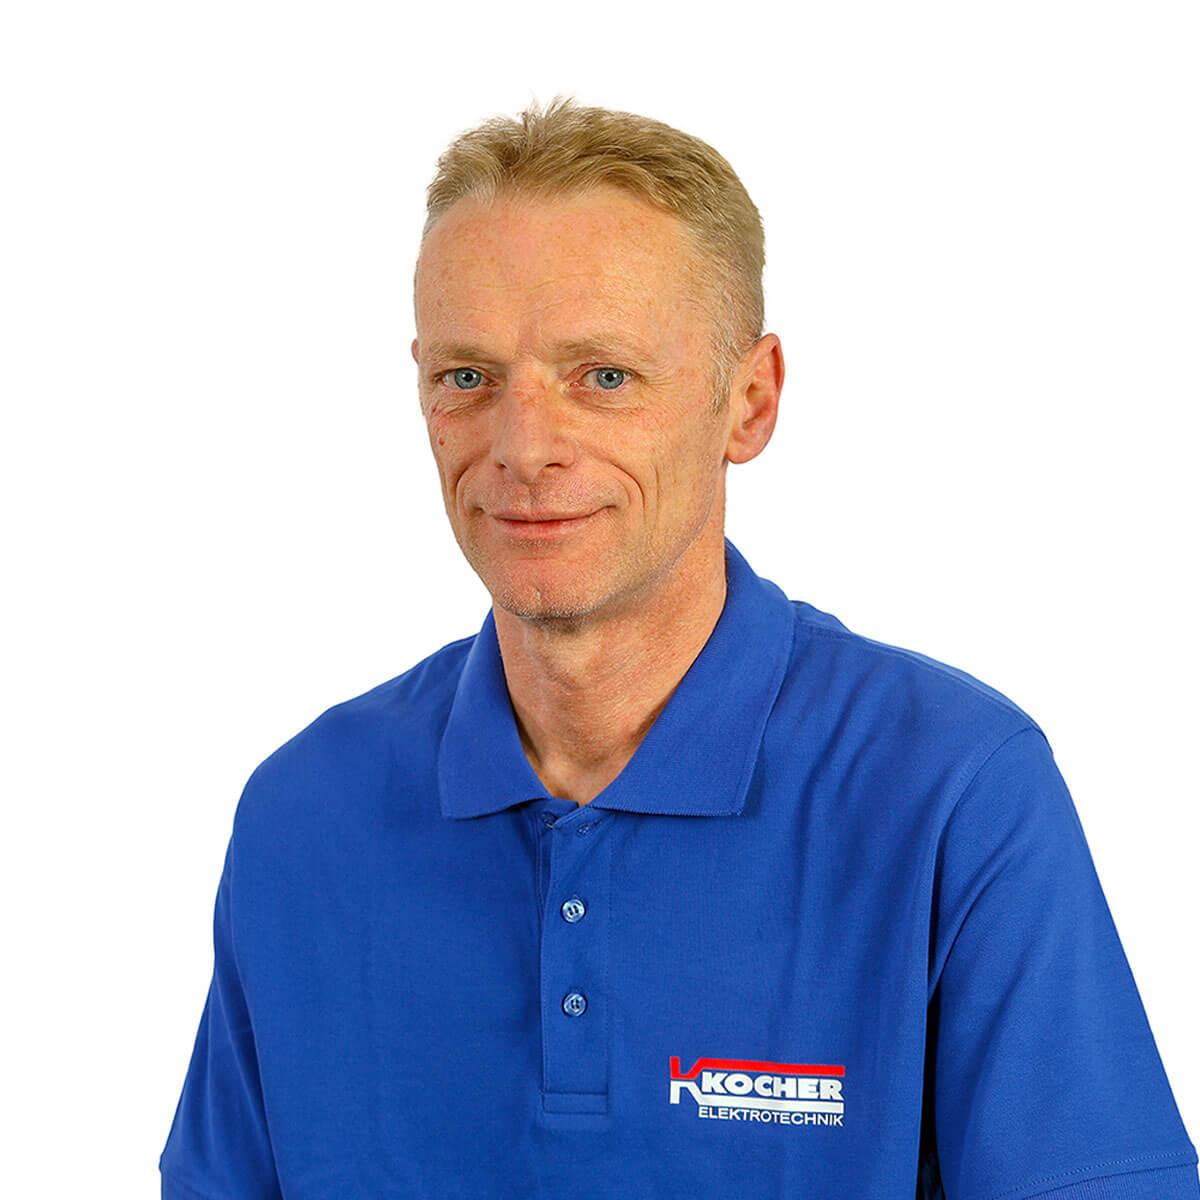 Arnold Klück Lagerist der Kocher Elektrotechnik Dortmund